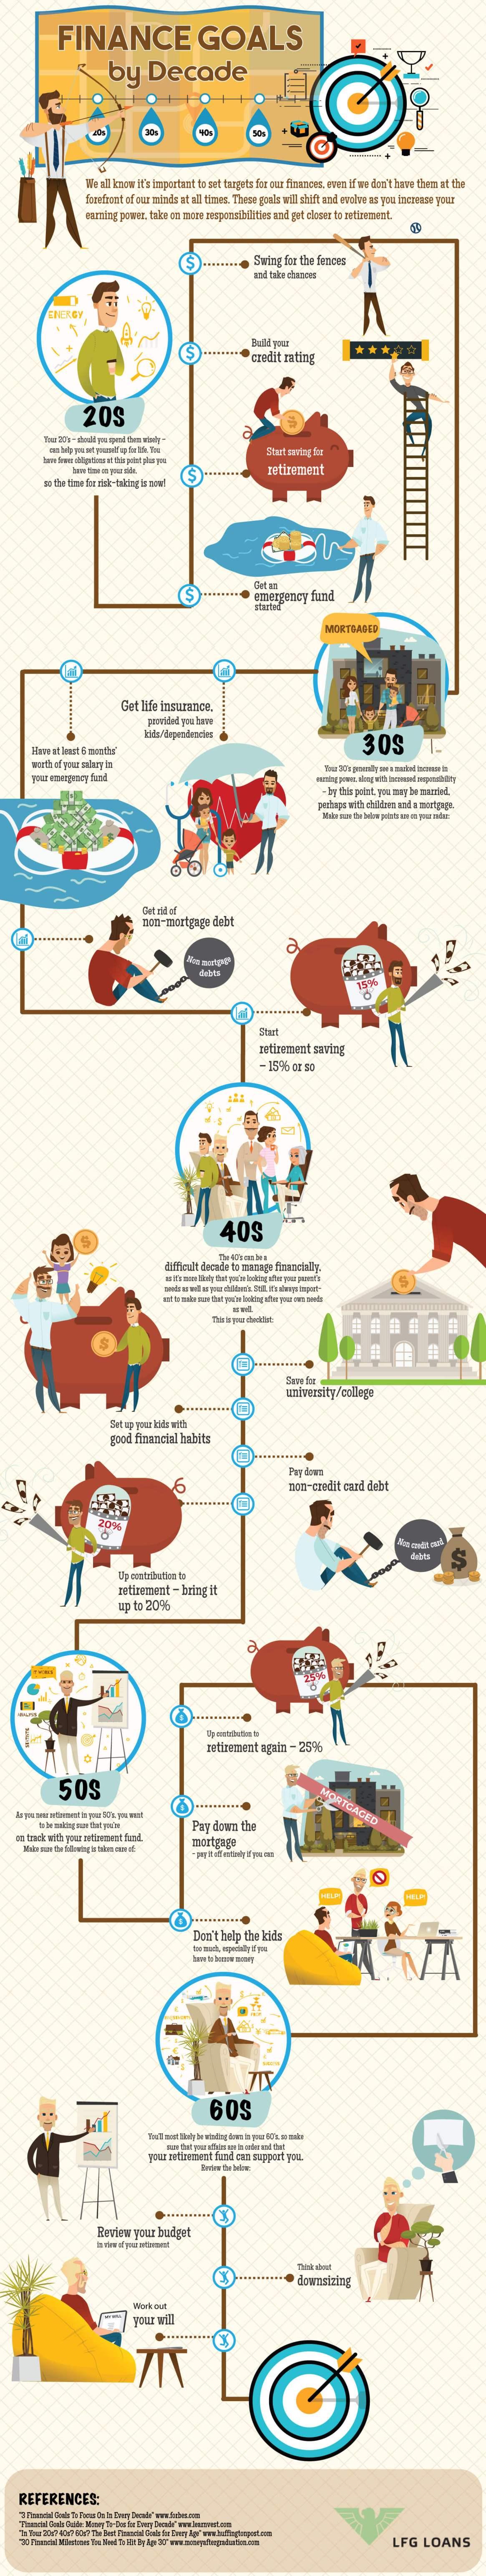 Finance Goals By Decade